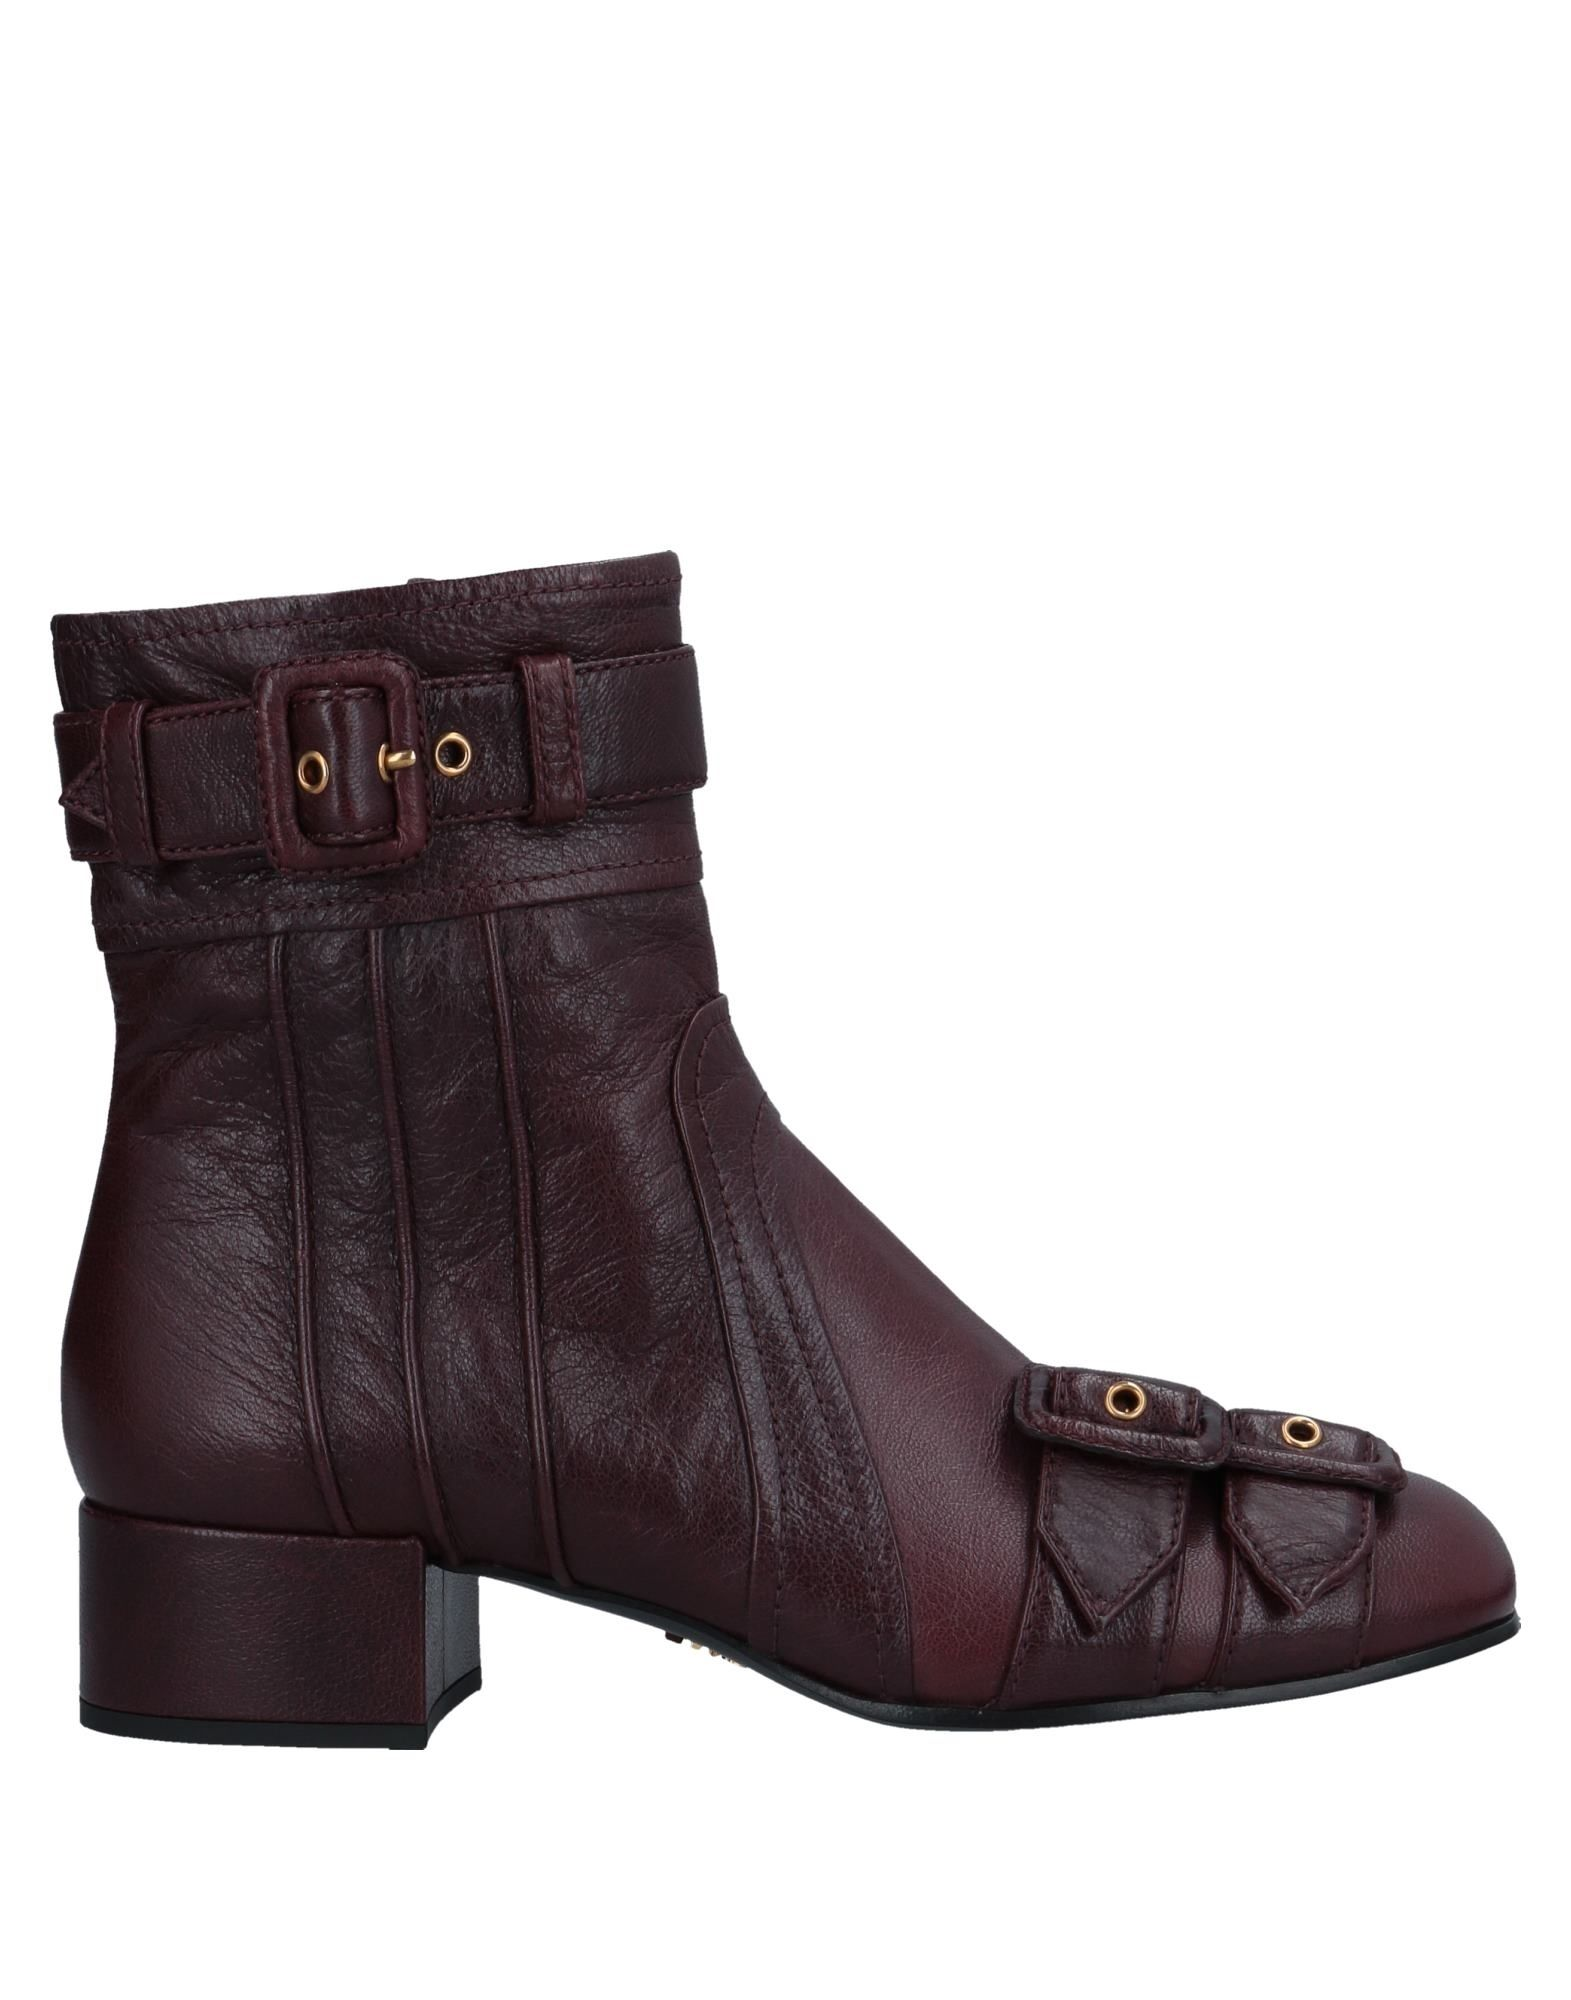 Prada Ankle Boot - Women Prada  Ankle Boots online on  Prada United Kingdom - 11547254OP 976cc6